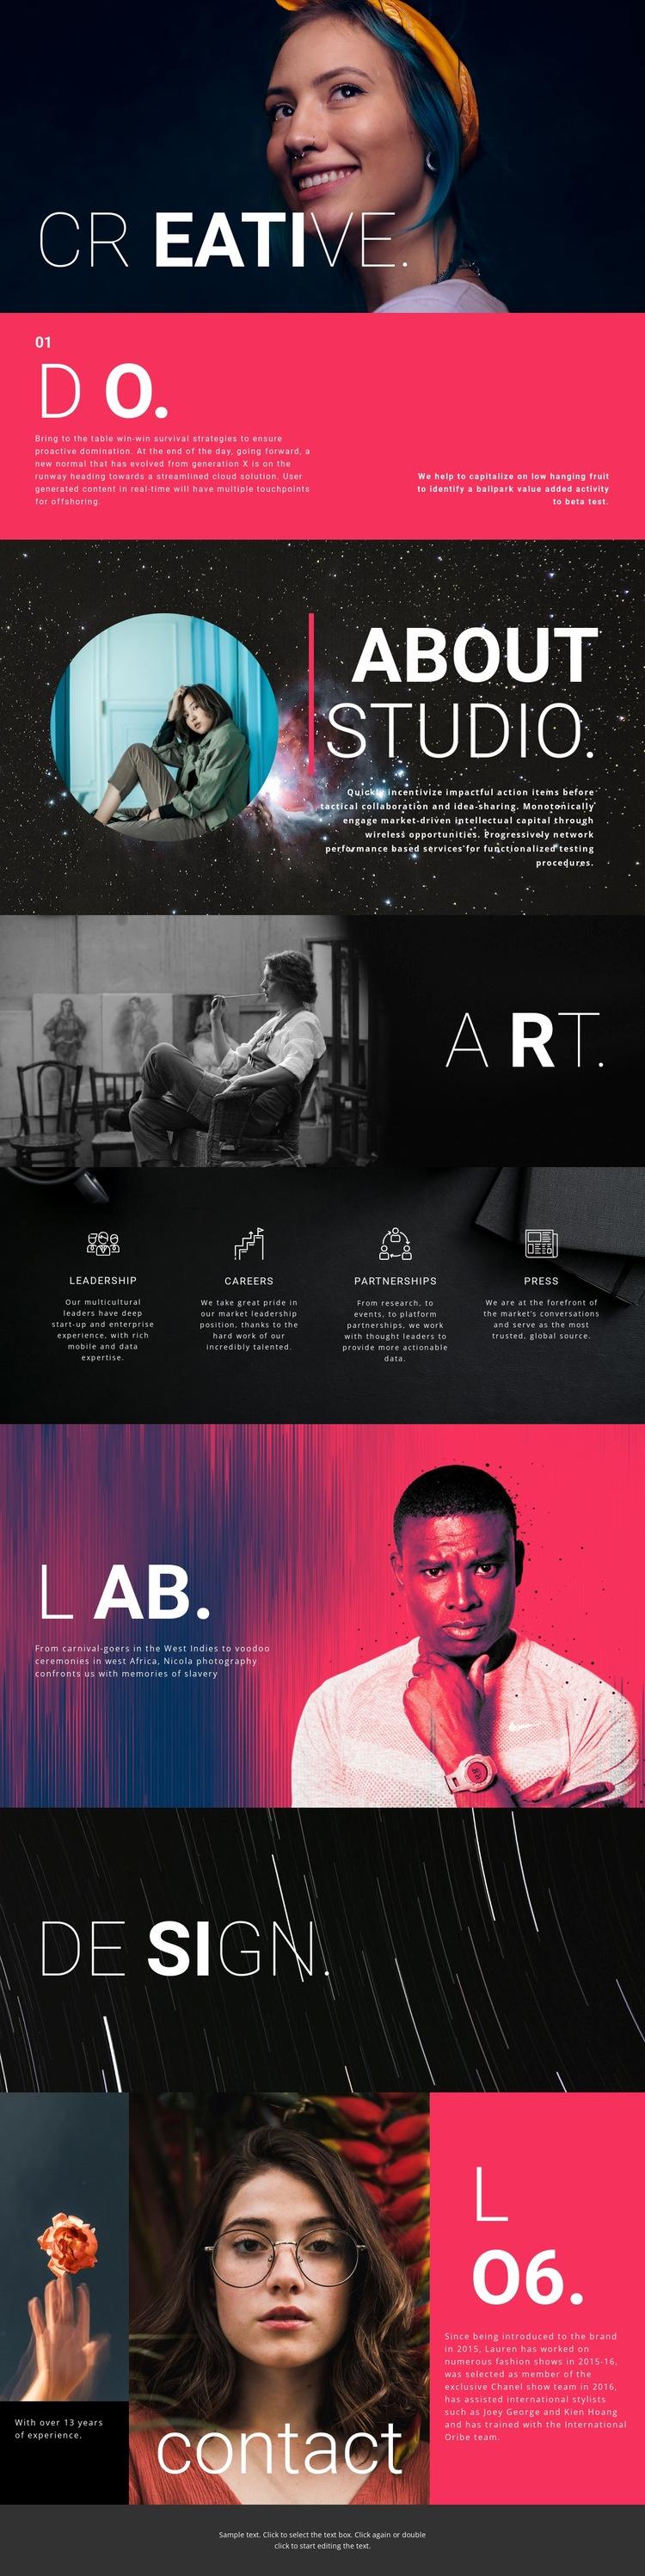 Creative design studio Html Code Example